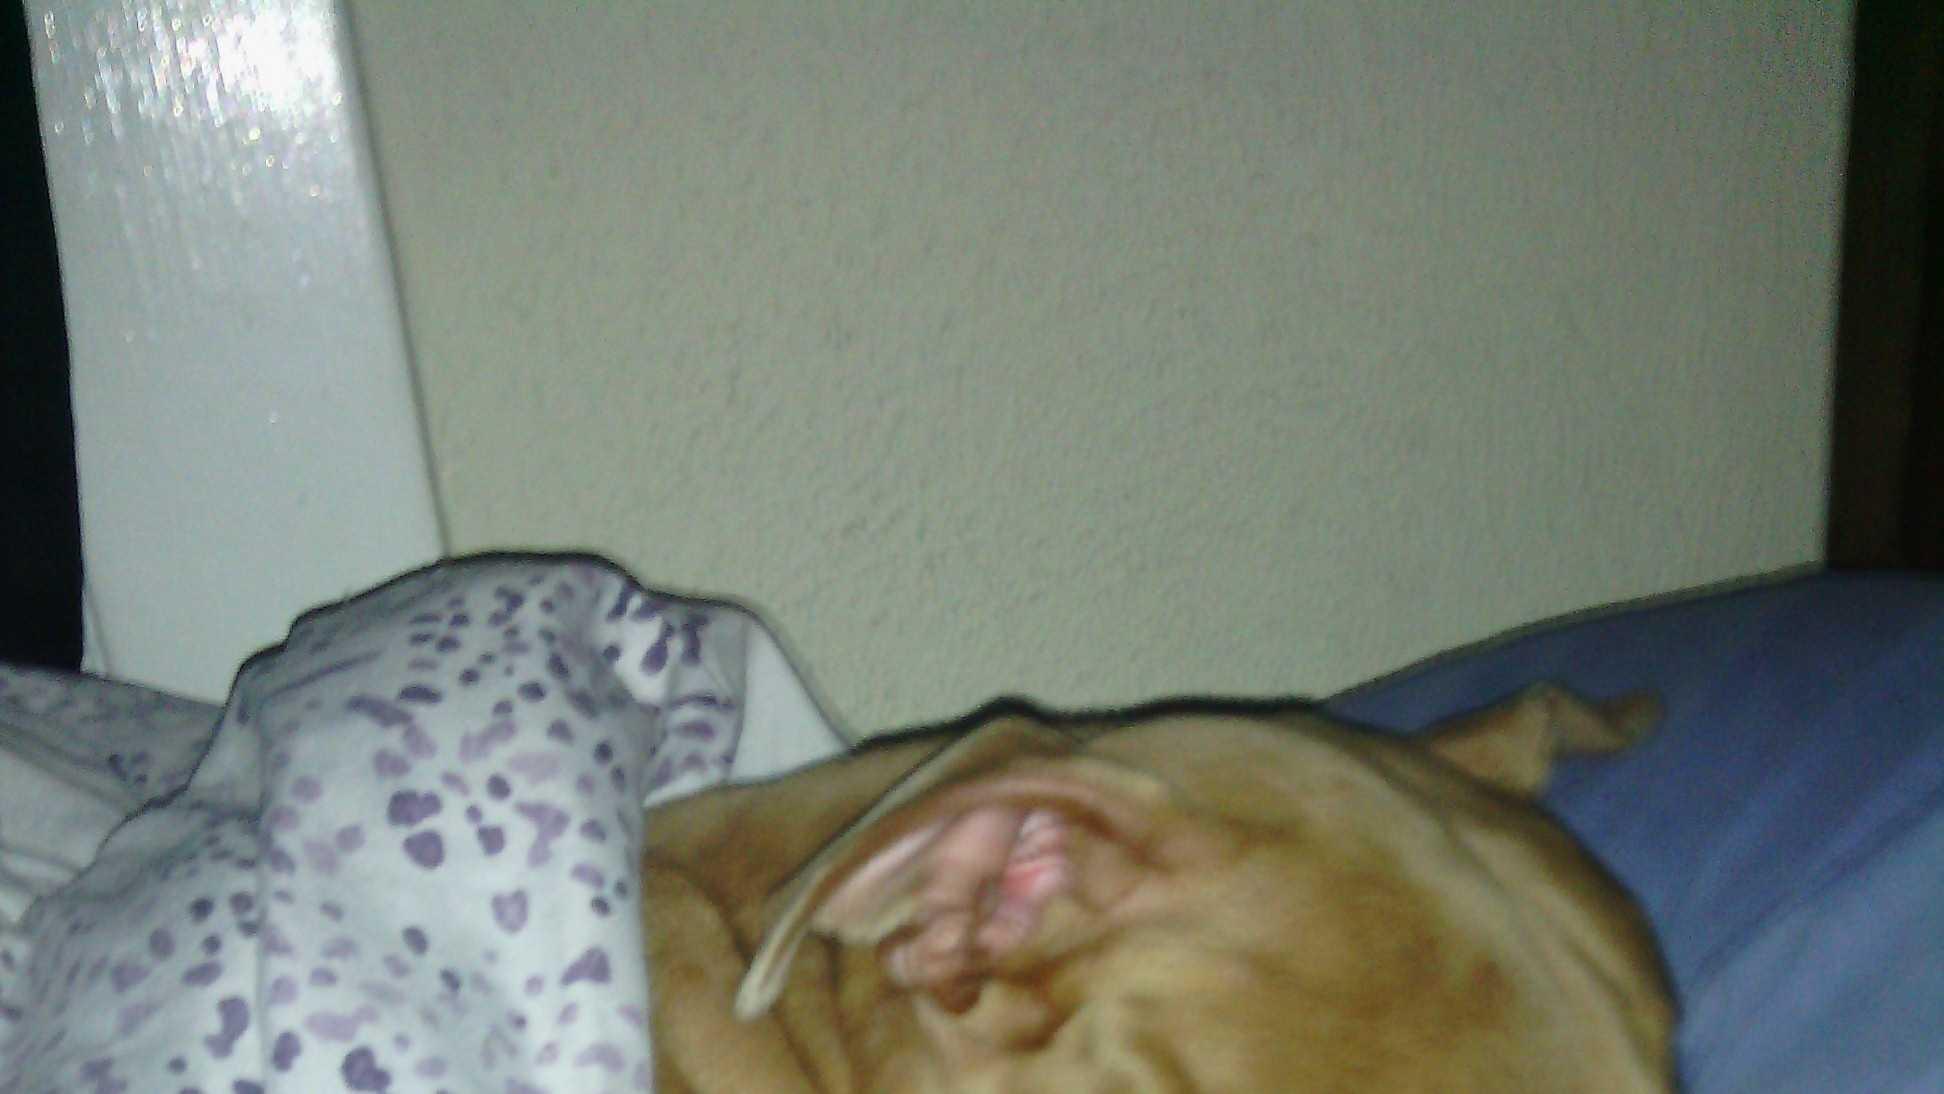 Orange deputy shoots dog, owner cries foul